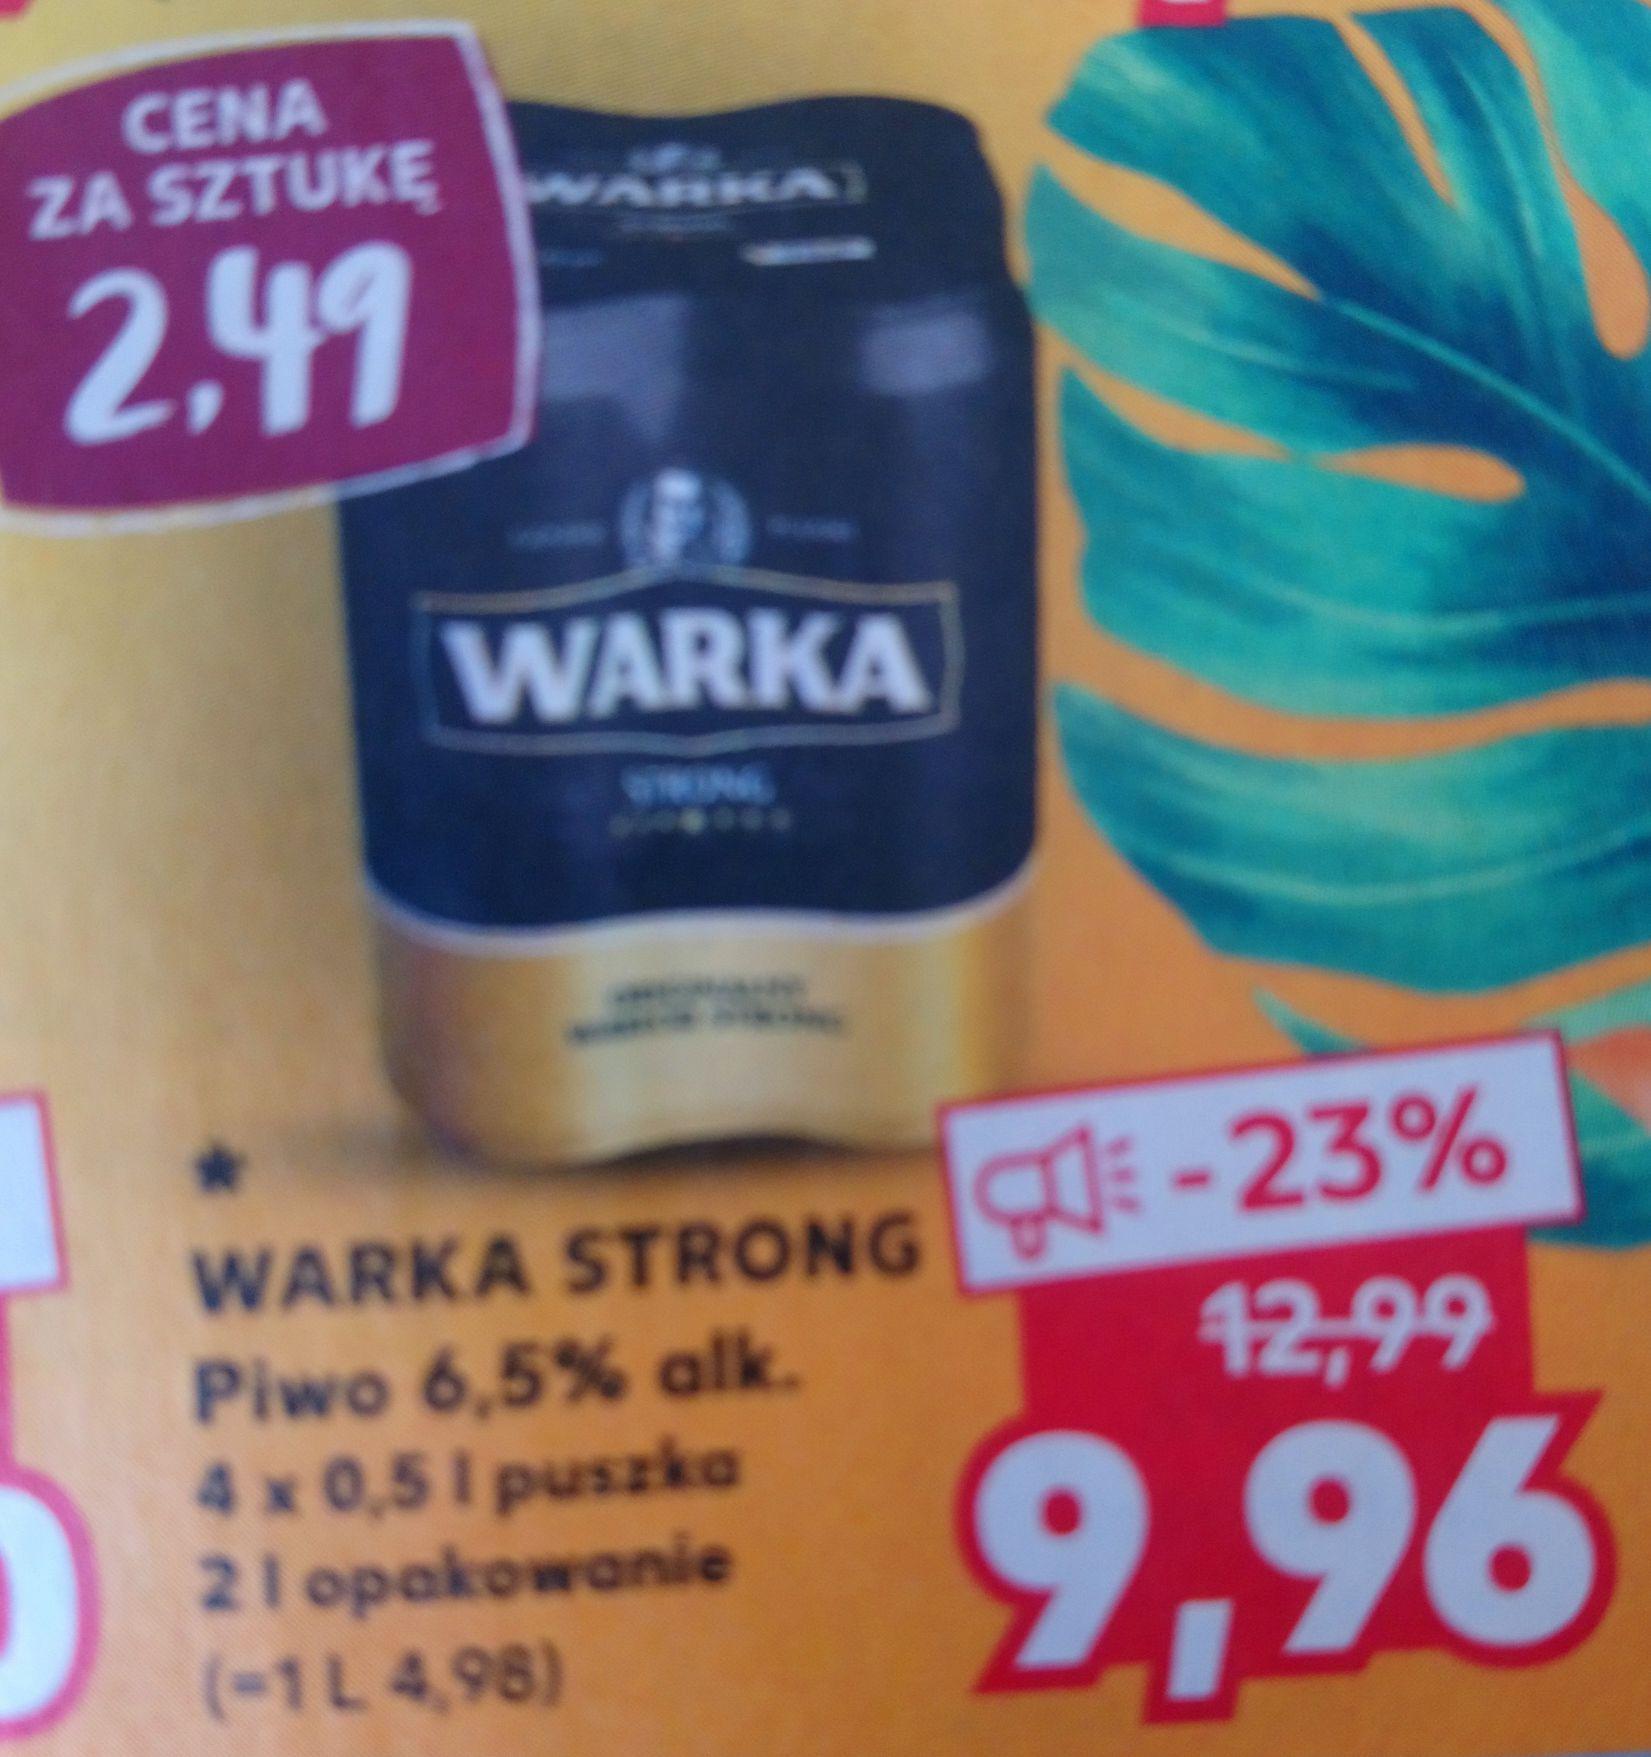 WARKA STRONG Piwo 4x0,5l 6,5% alk. Kaufland